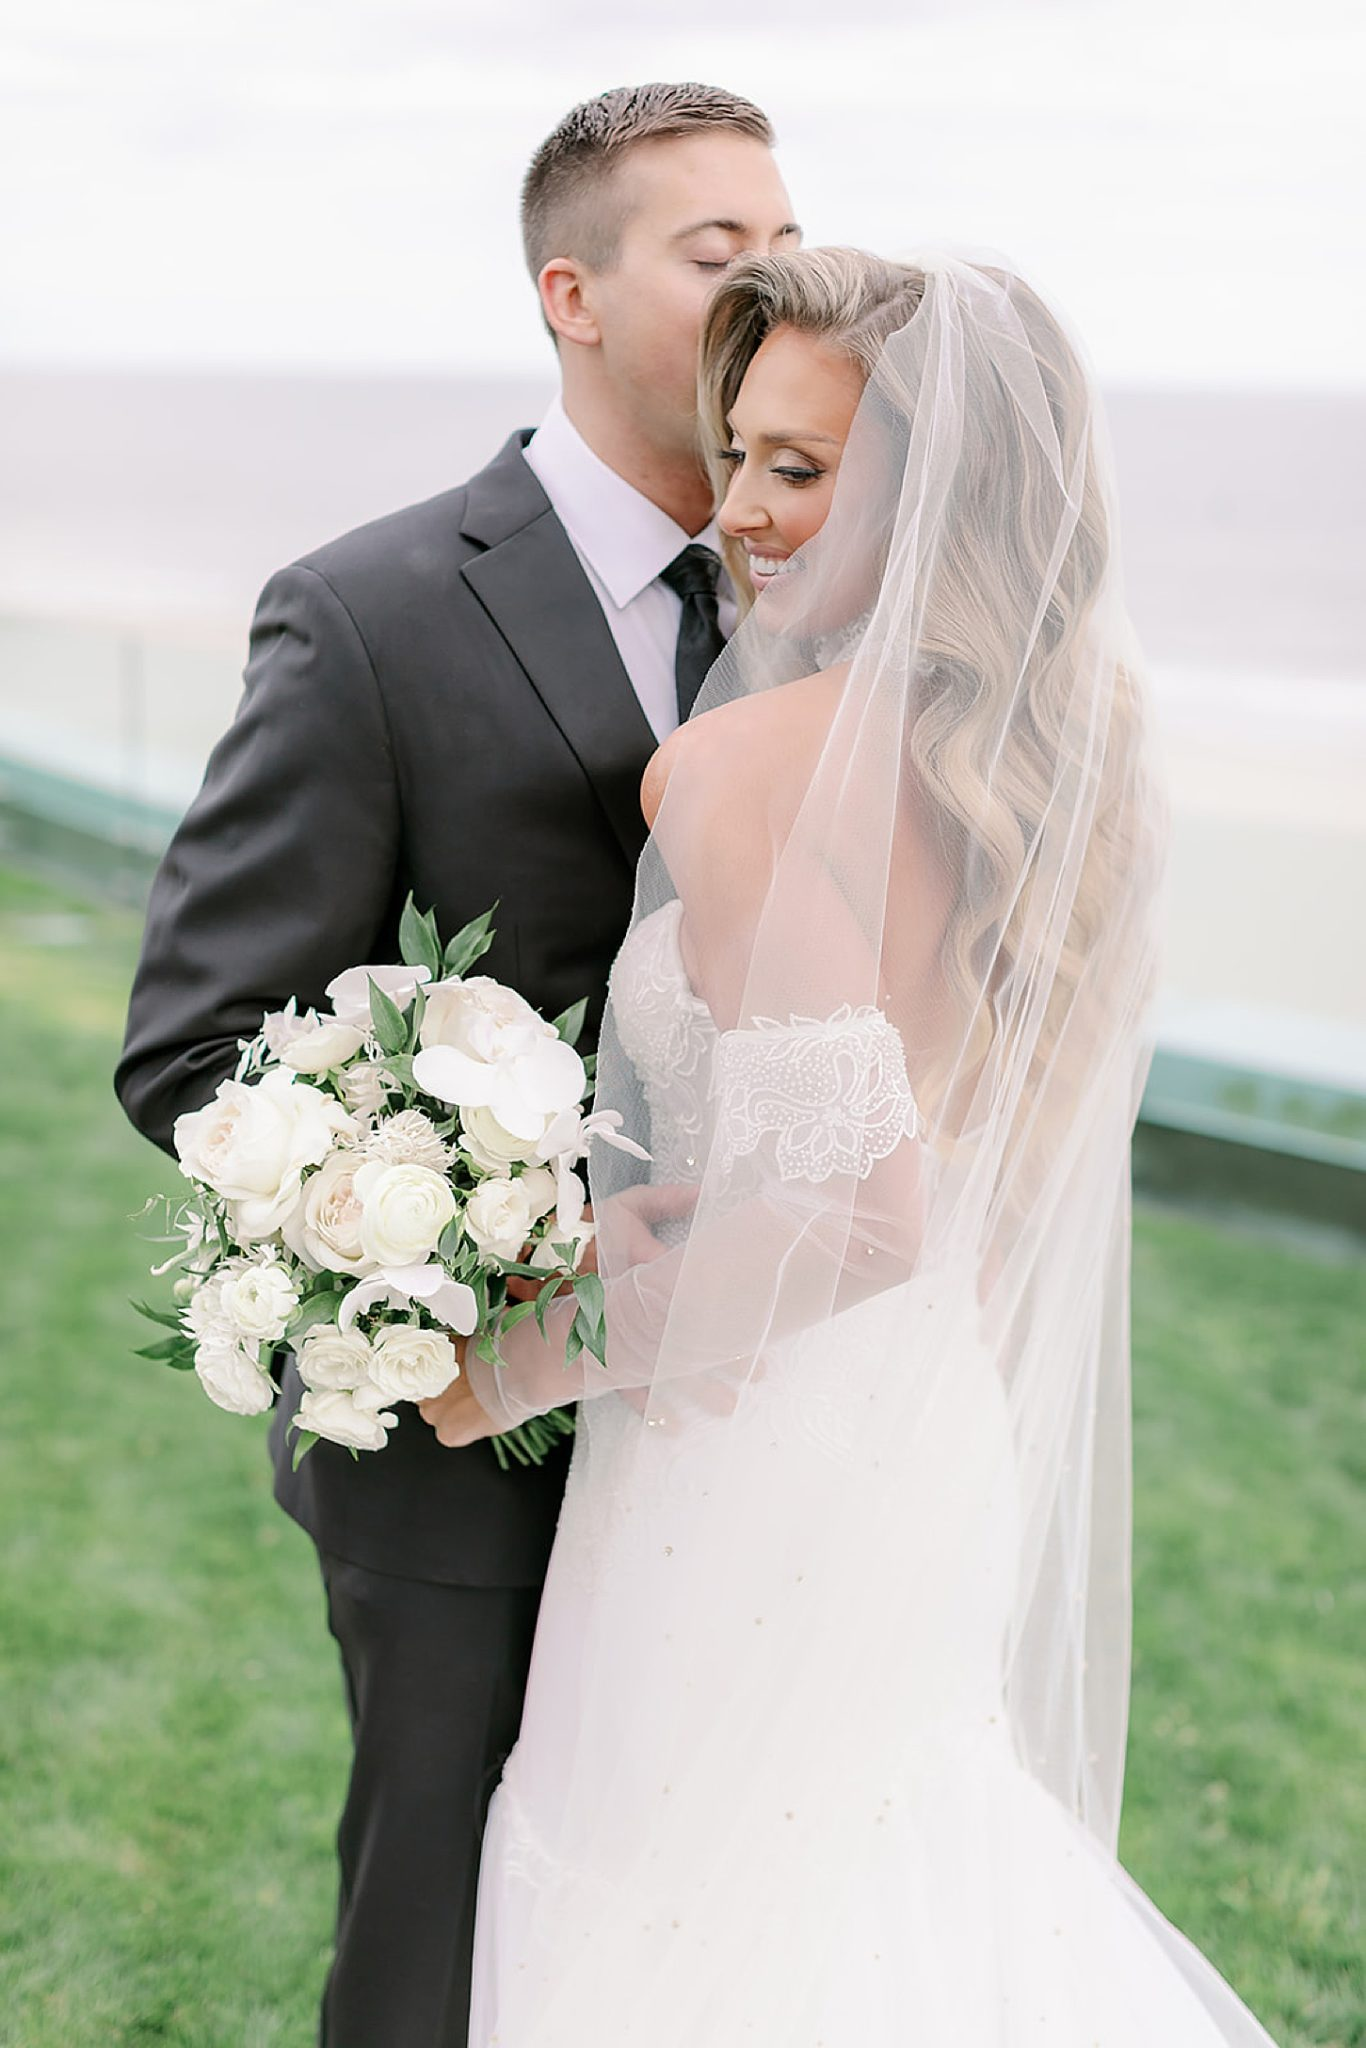 Atlantic City Wedding Photography Studio by Magdalena Studios Lexy Cha 0050 scaled